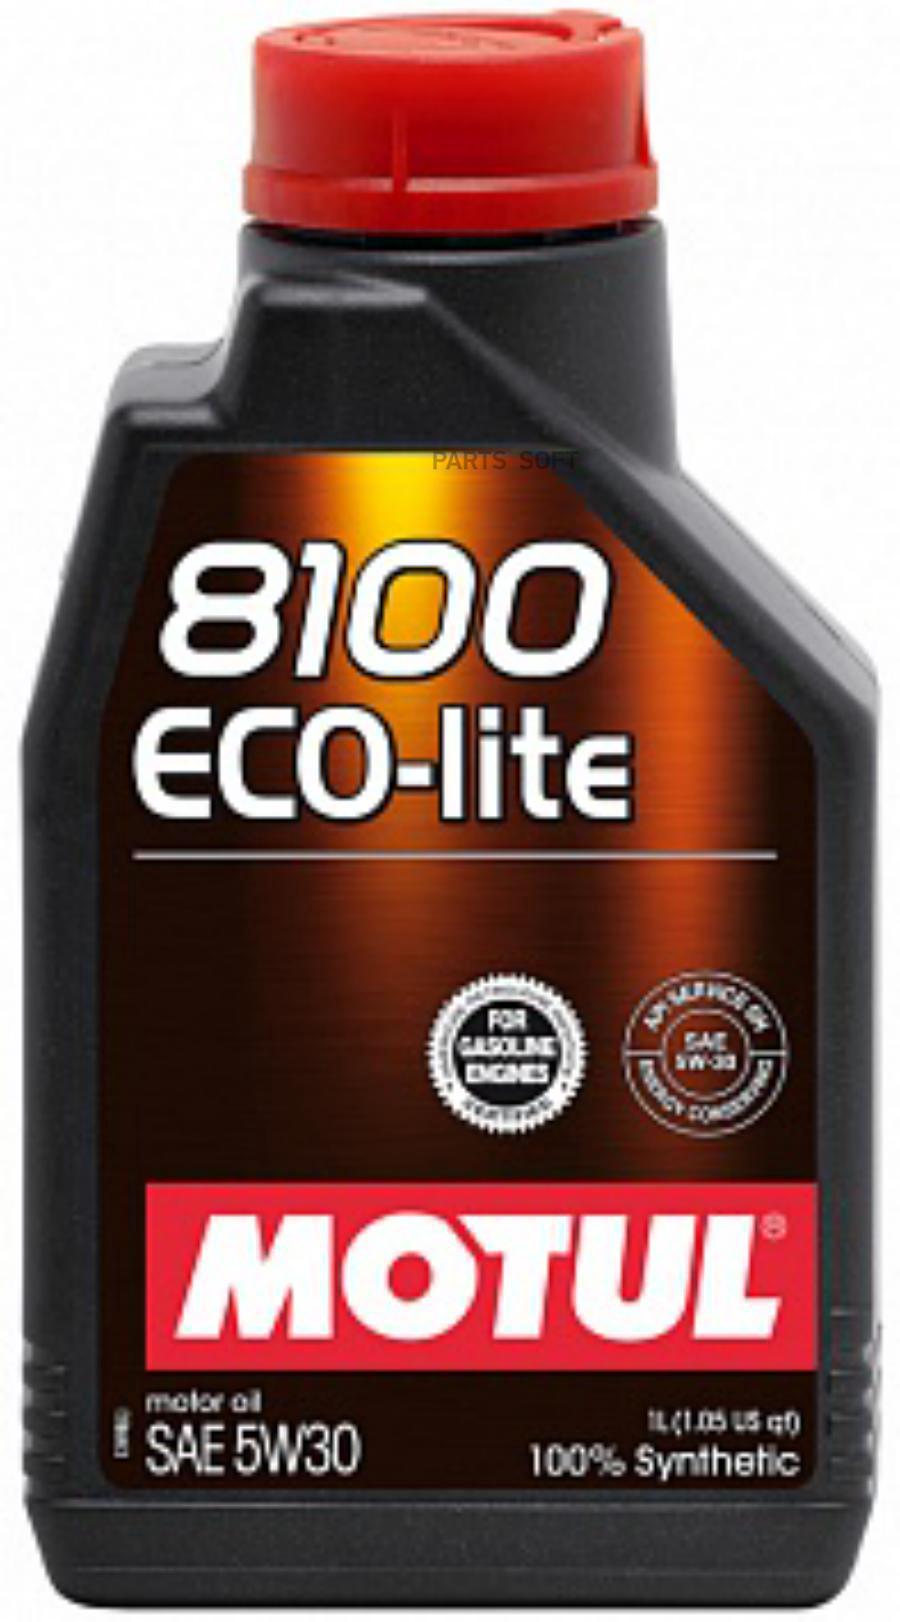 Масло моторное синтетическое 8100 Eco-lite 5W-30, 1л